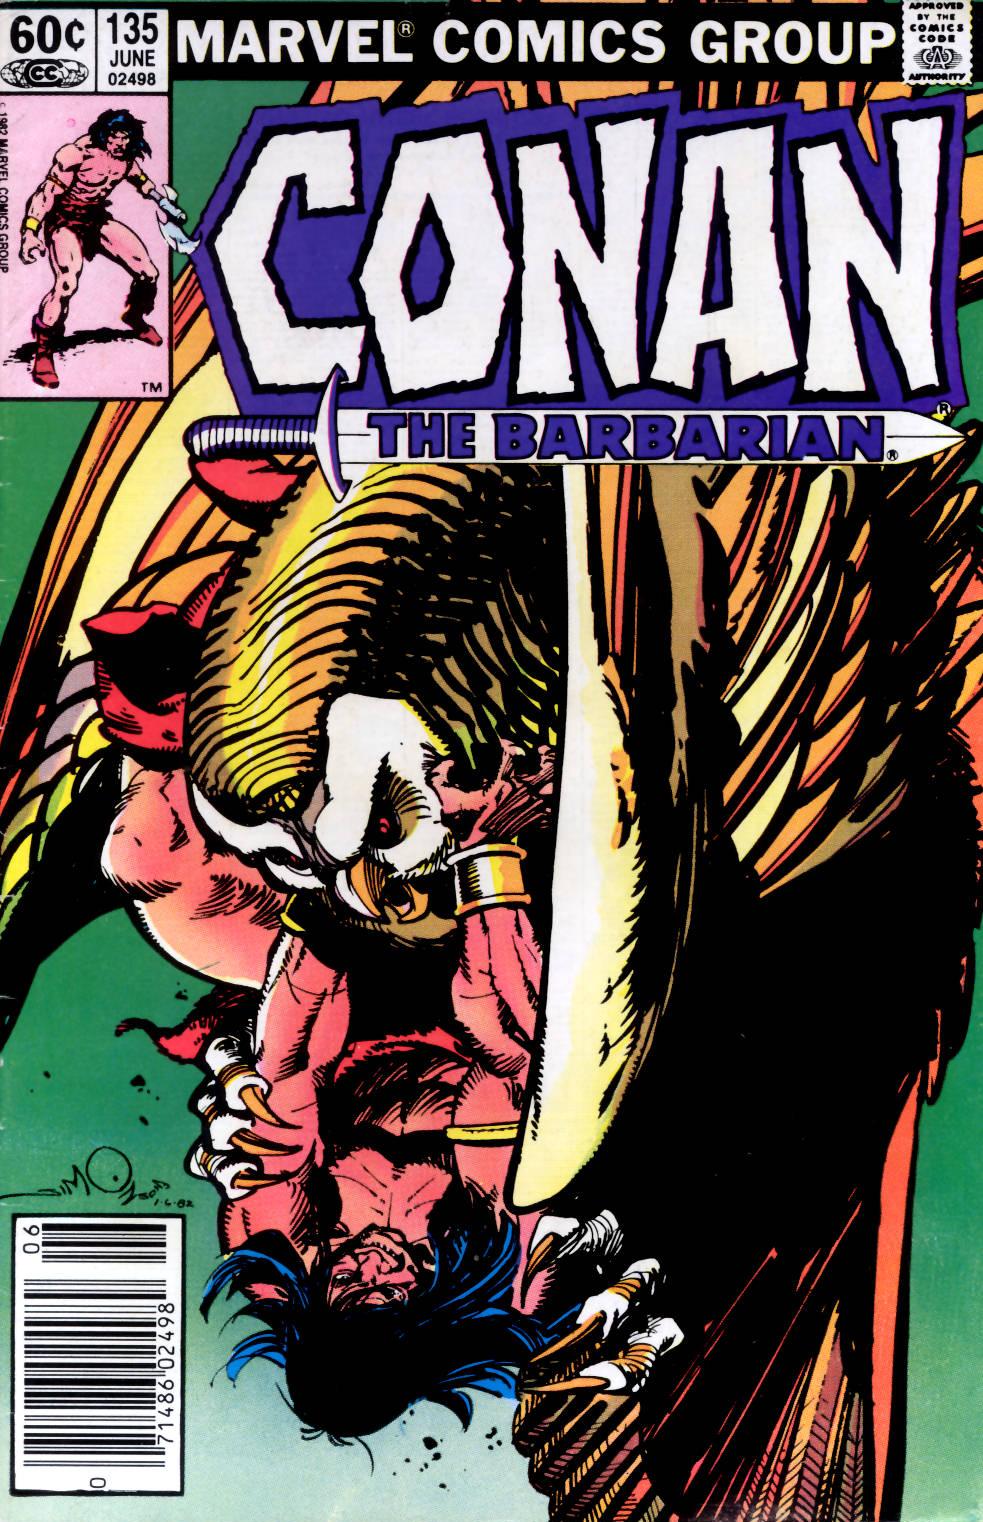 Conan the Barbarian 135